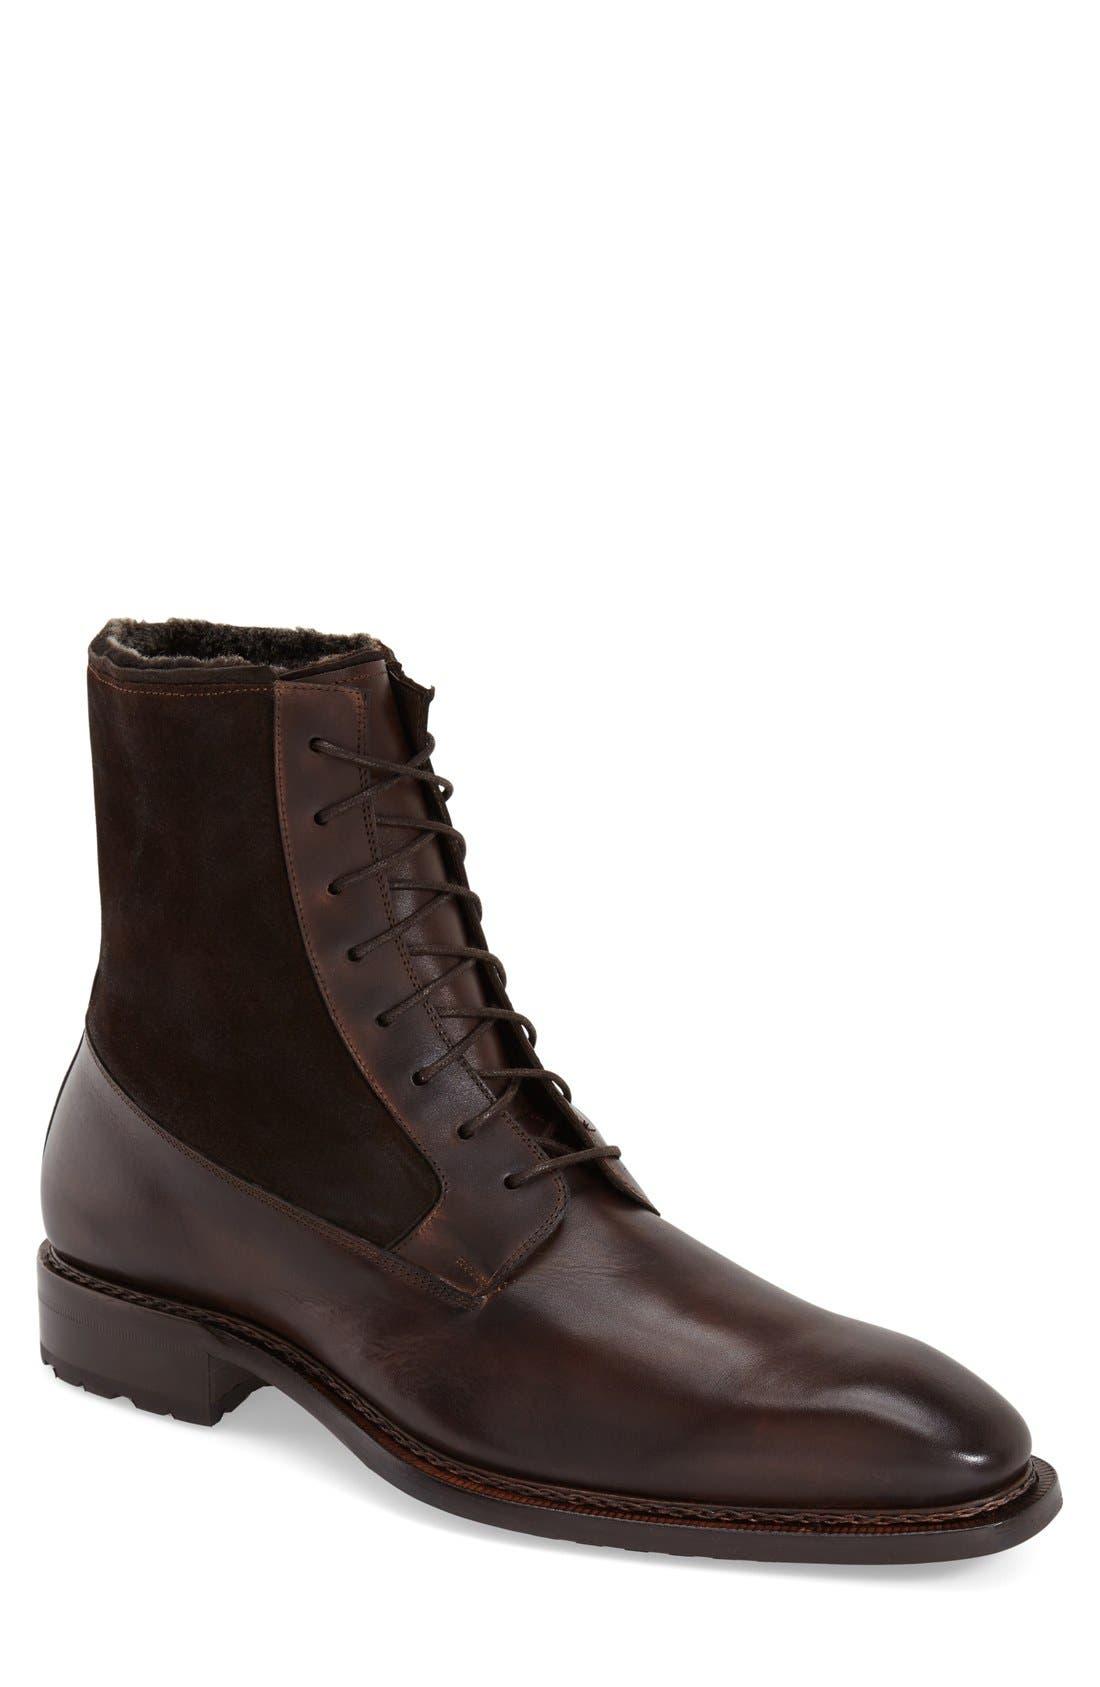 'Luzern' Genuine Shearling Boot,                         Main,                         color,